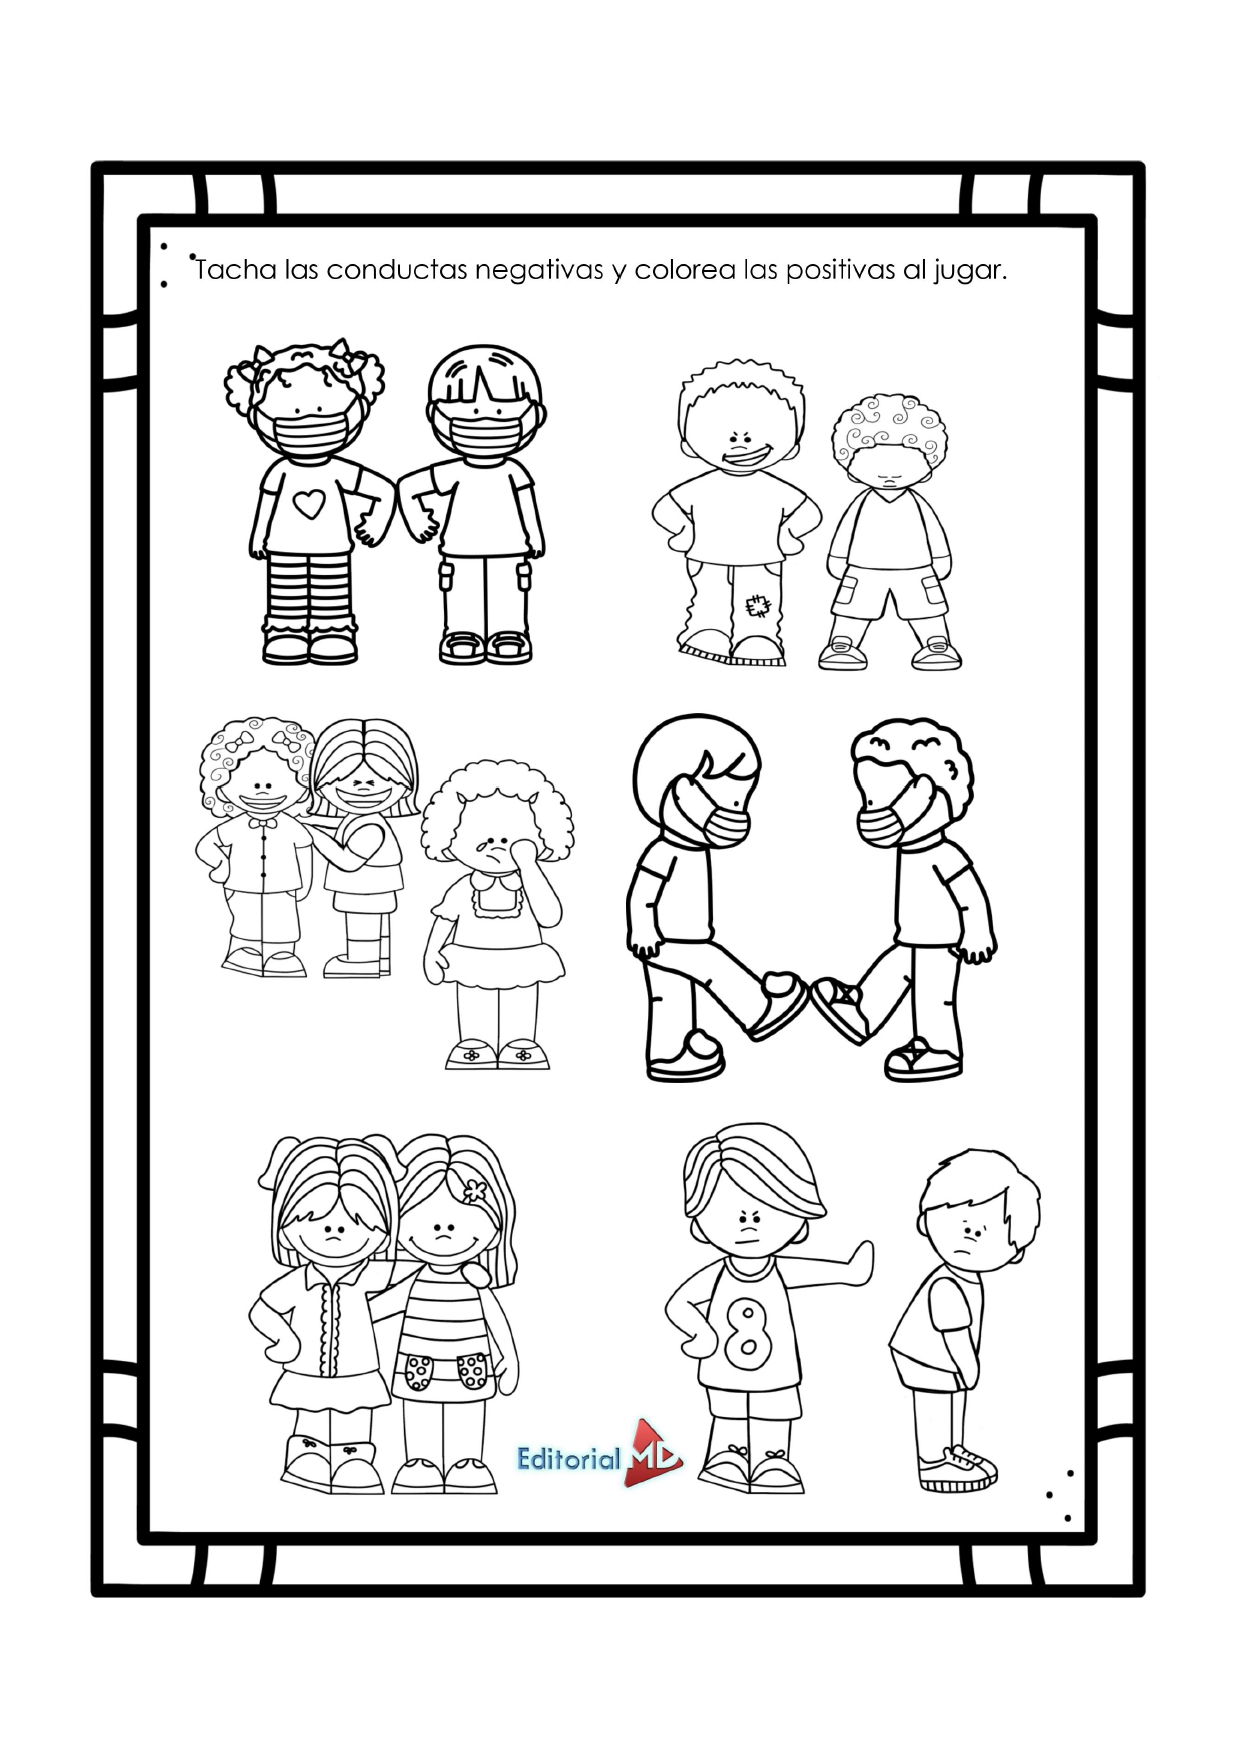 Ejemplo Material de apoyo semana 15 preescolar 02